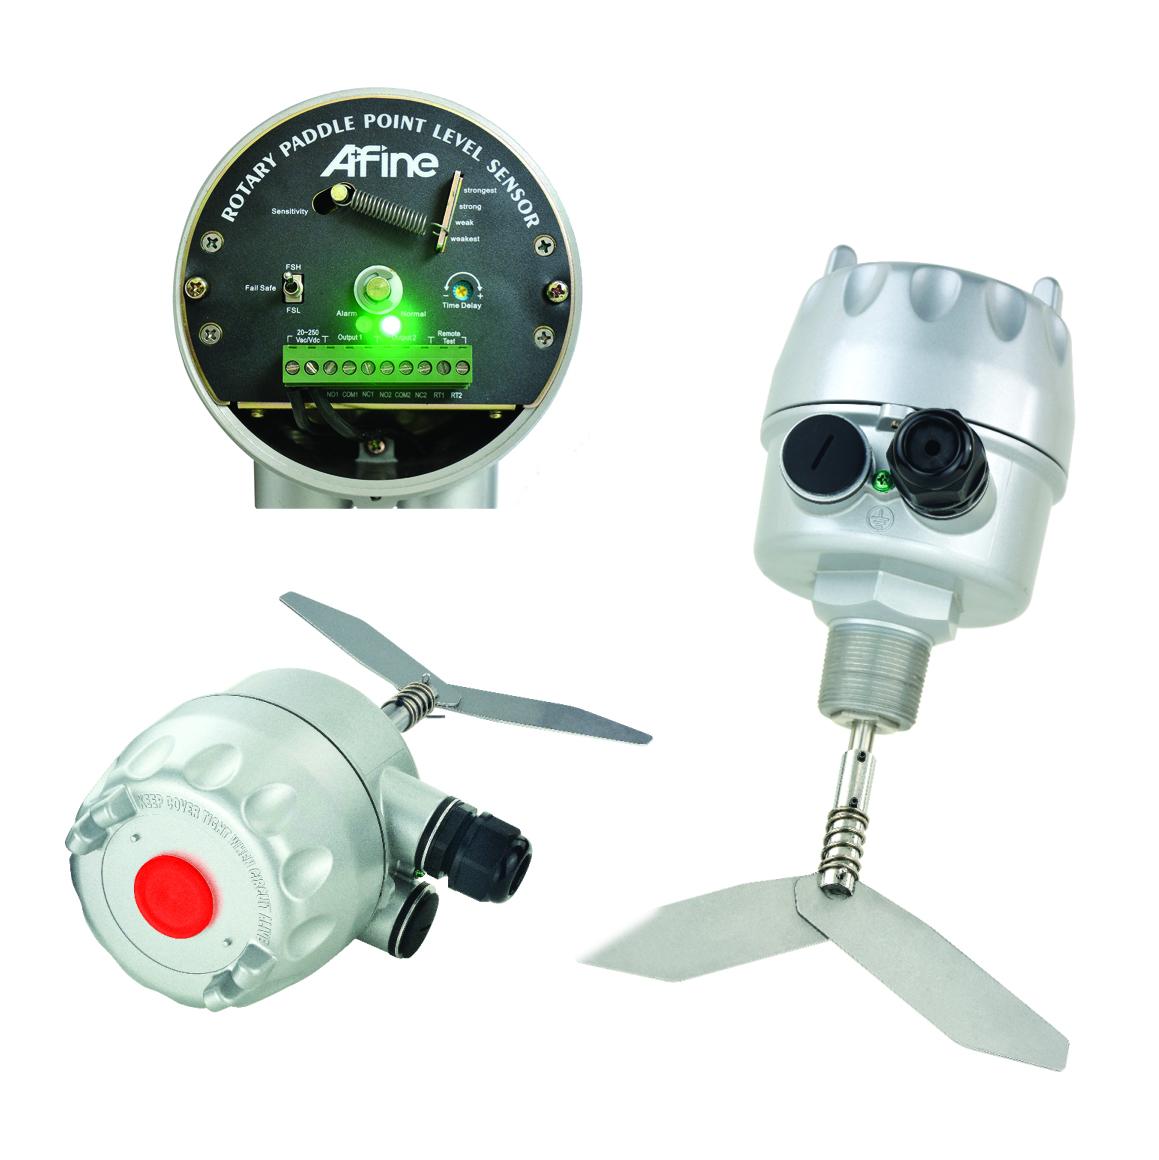 SRP Paddle wheel level sensor